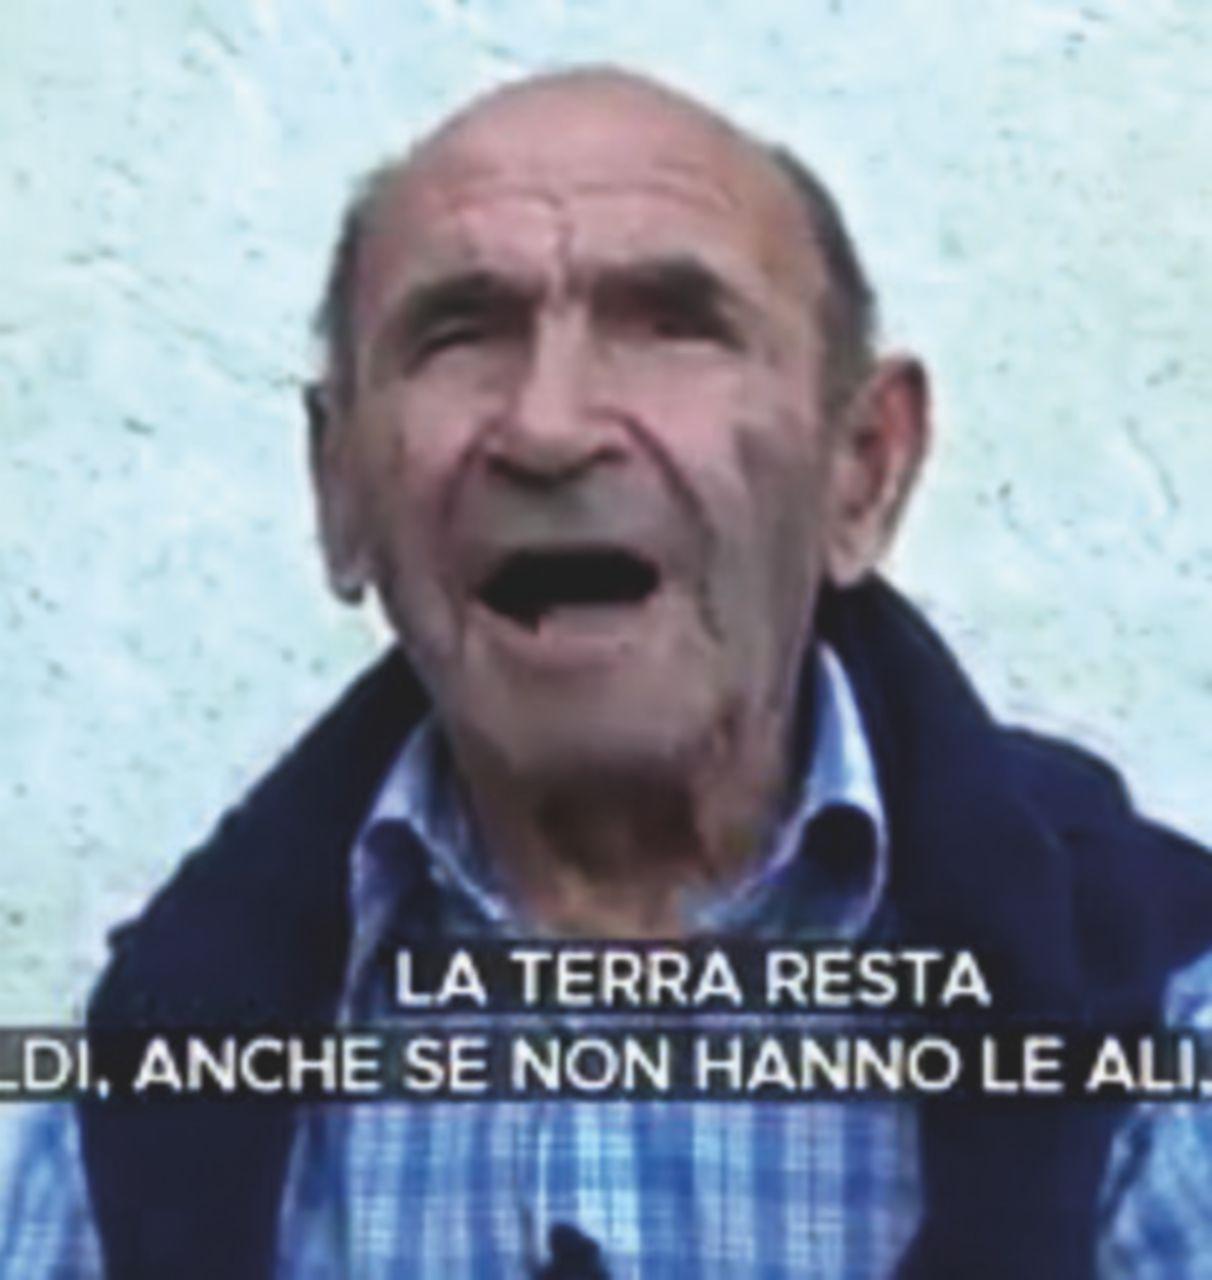 Sardegna, il pastore ottantenne sconfigge Benetton e soci